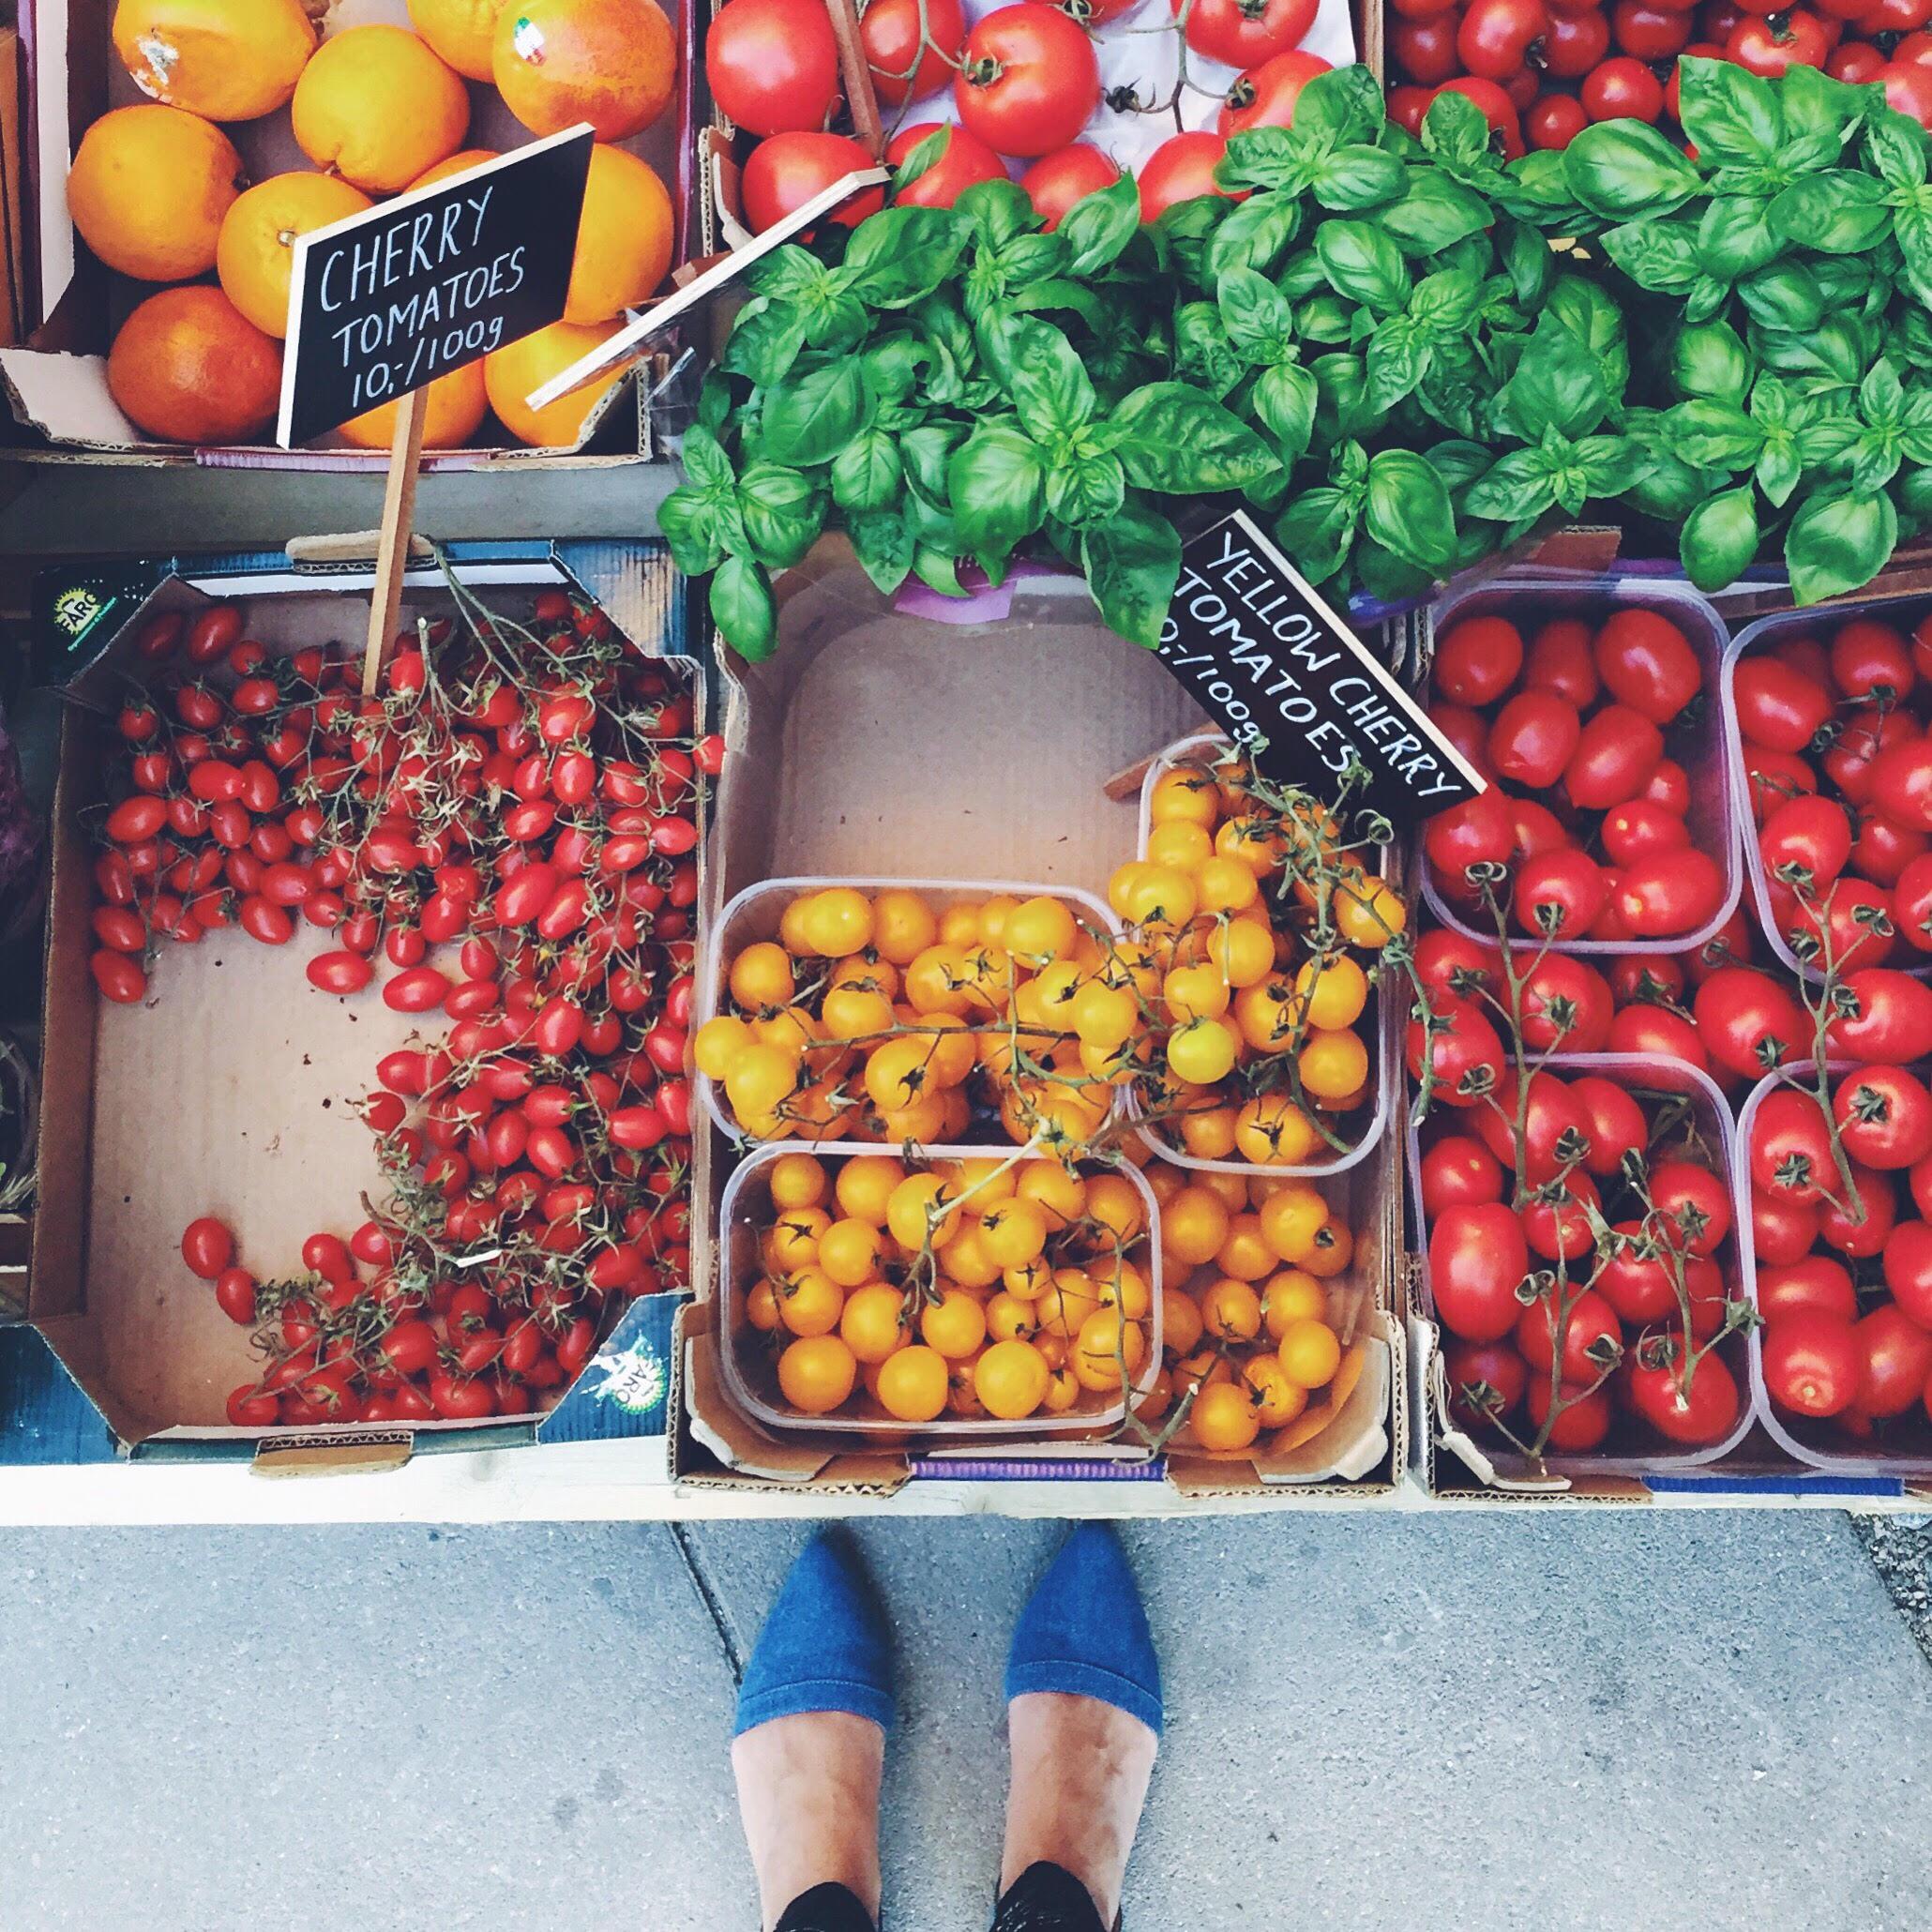 Danske råvarer; tomater i flere farver og frisk basilikum